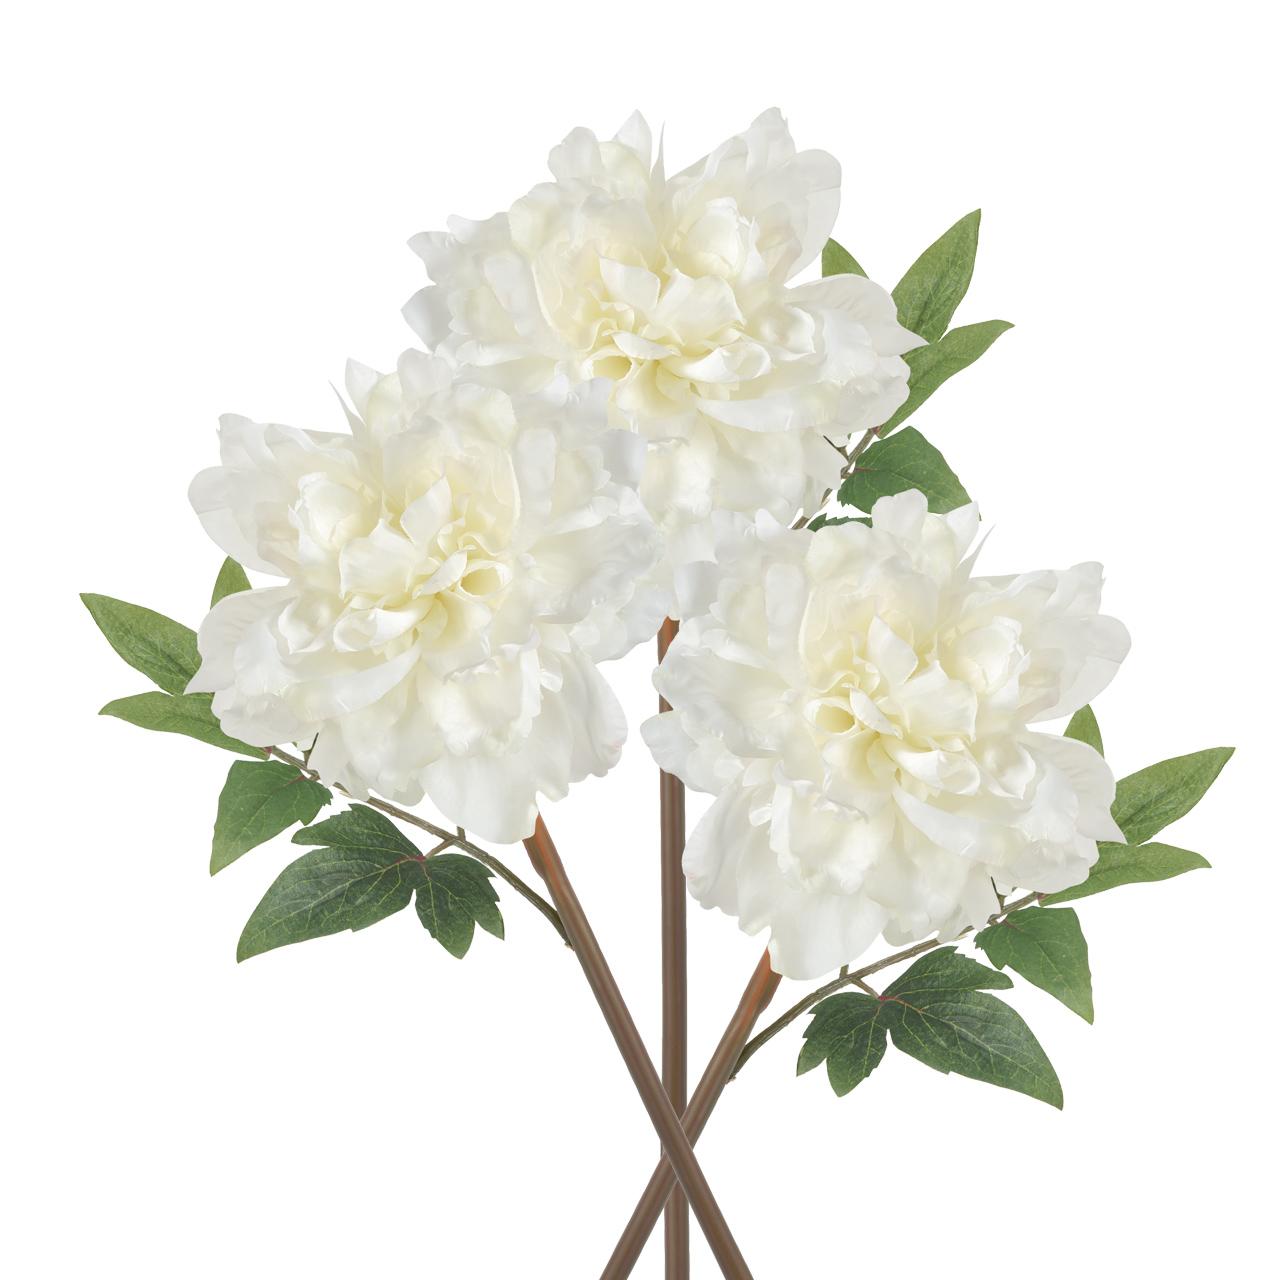 {} ARTEVALUCE Искусственный цветок Пион (13х20х36 см - 3 шт) всесезонная шина matador mps 125 variant all weather 185 75 r16 104 102r